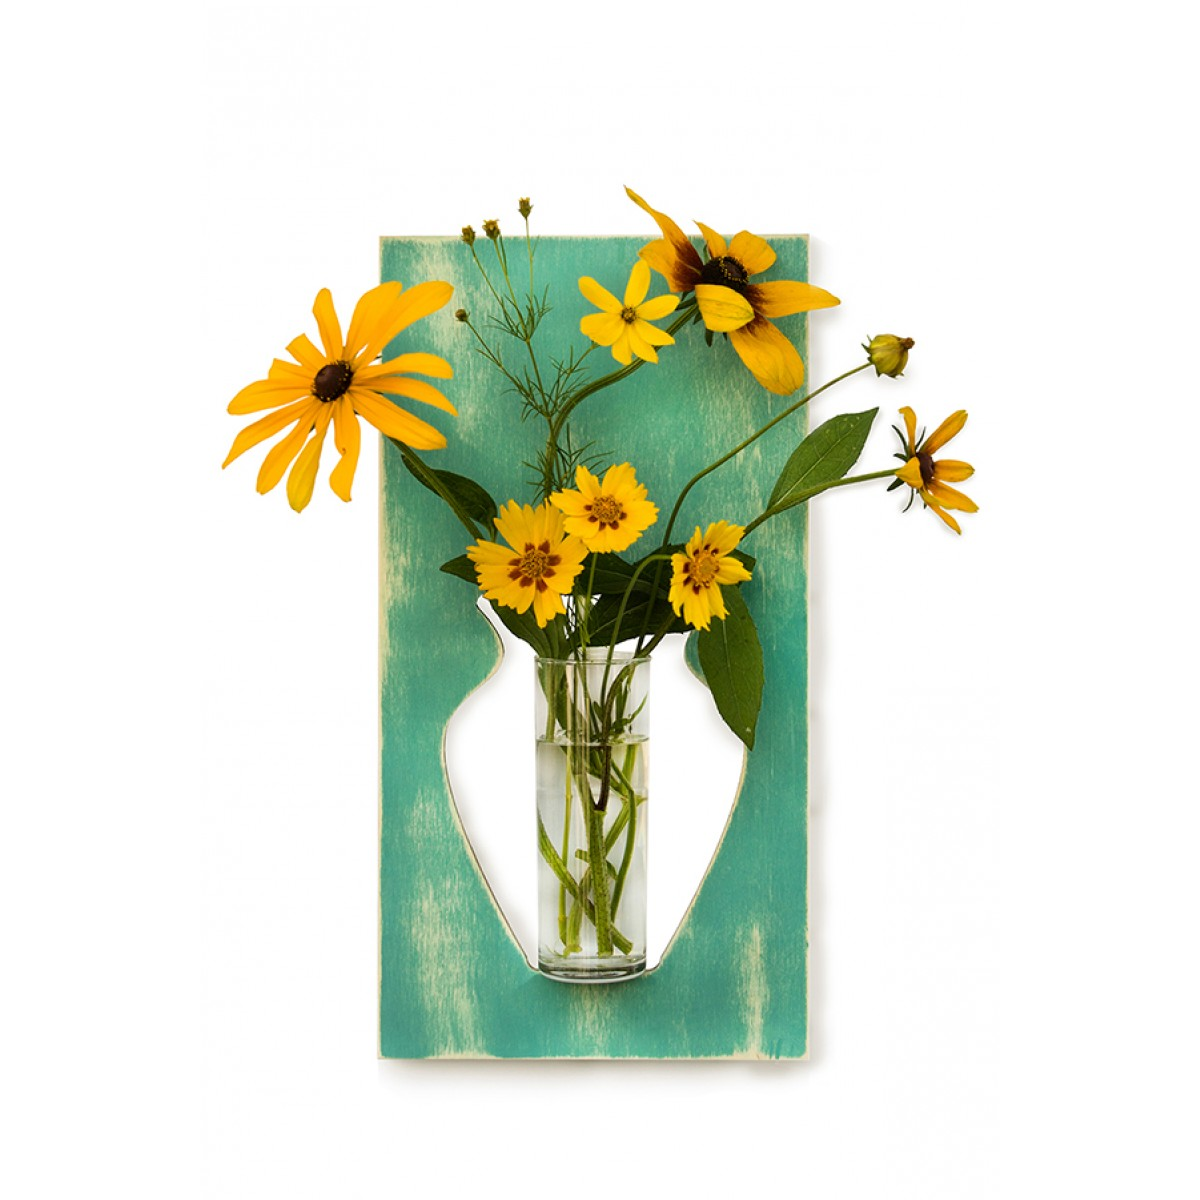 Wandvase flortrait vintage türkis